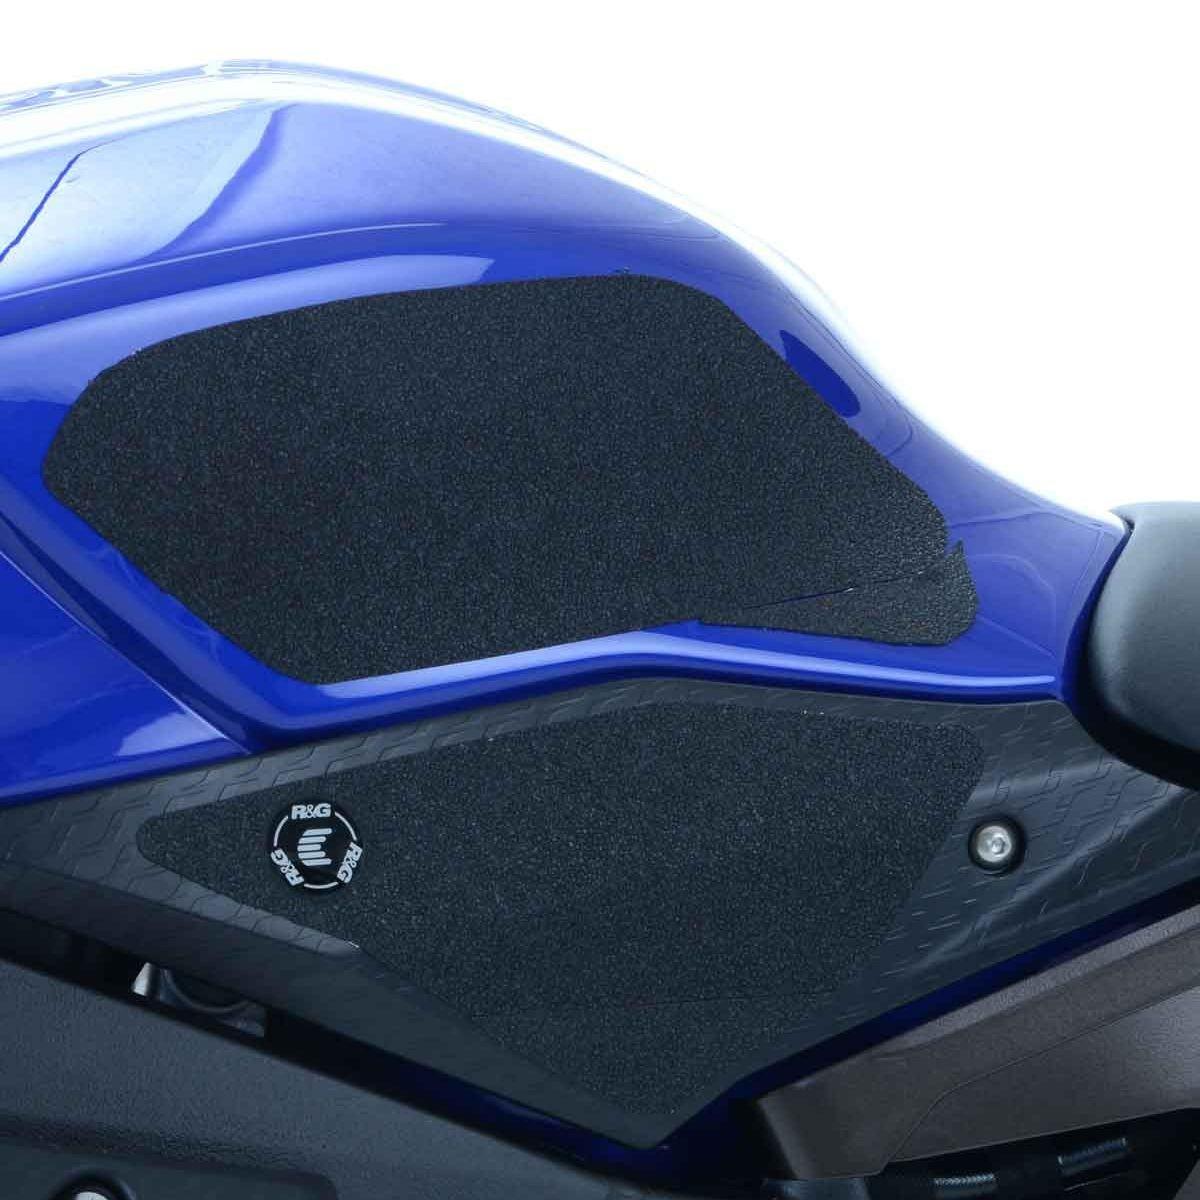 R/&G EaziGrip Traction Tank Grips Pad Protector Guard Black fits Yamaha YZF R1 R1S R1M